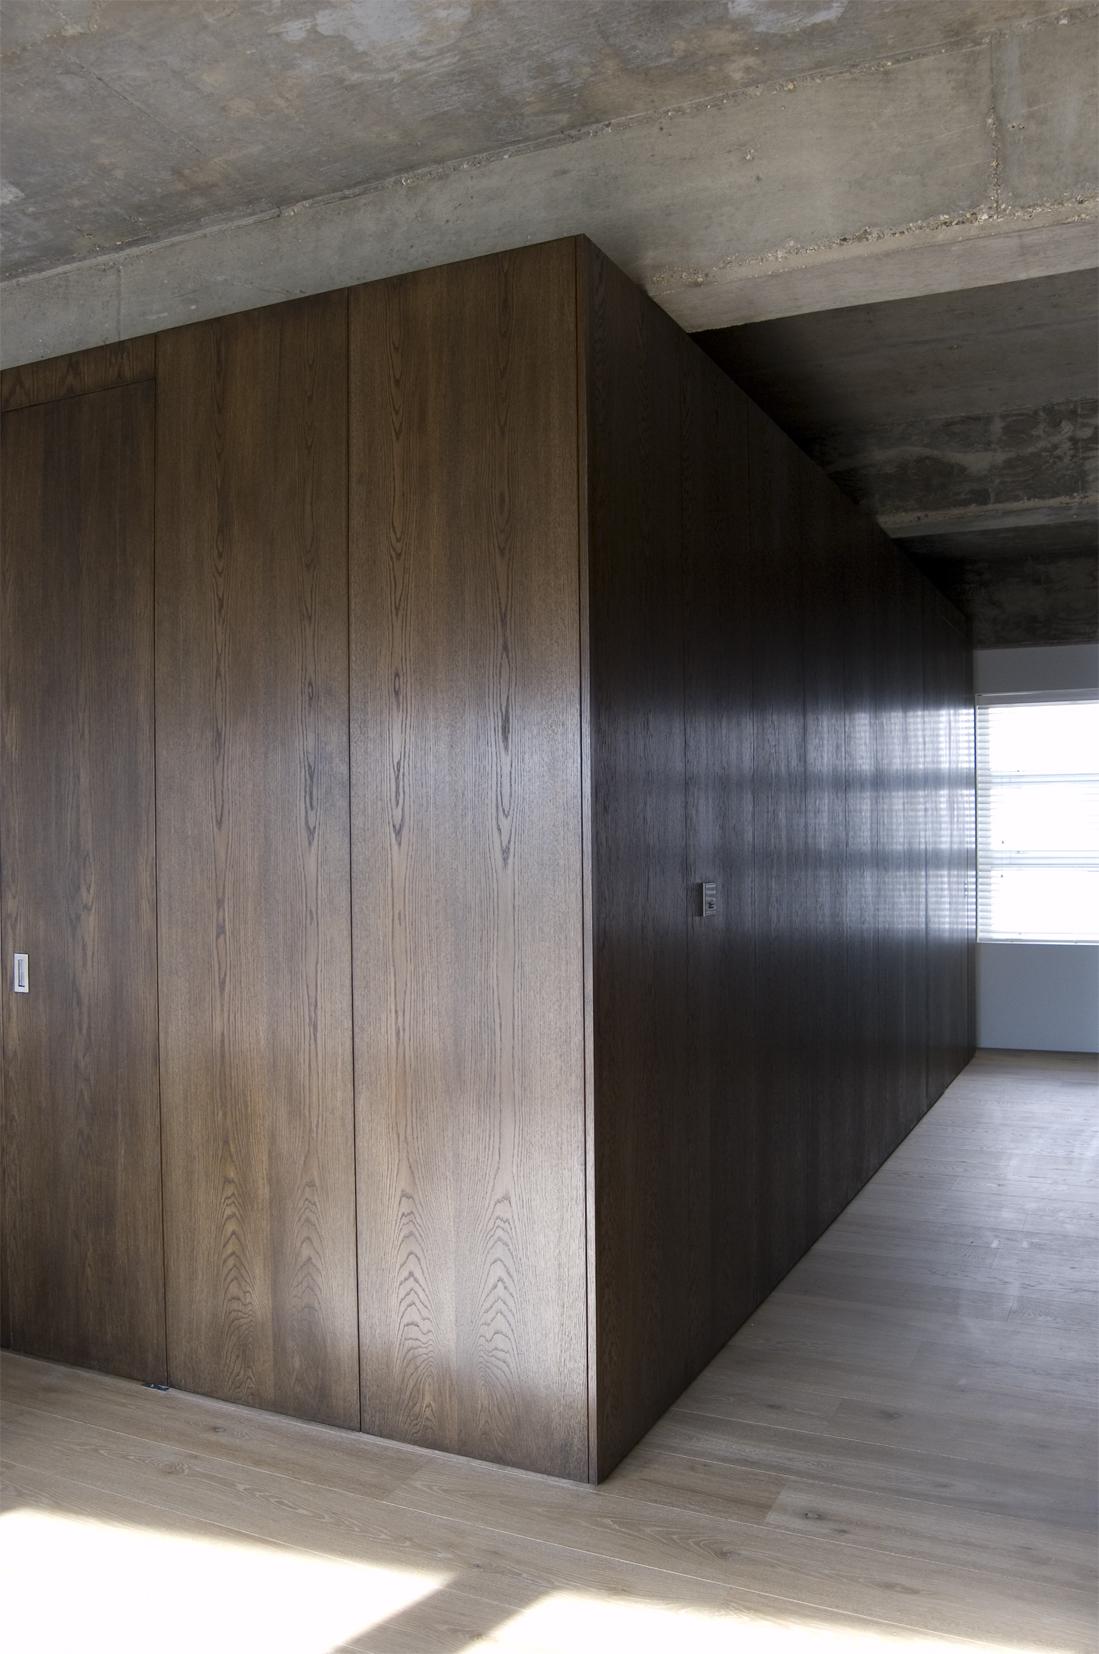 WTAD_horizontal_house_08.jpg